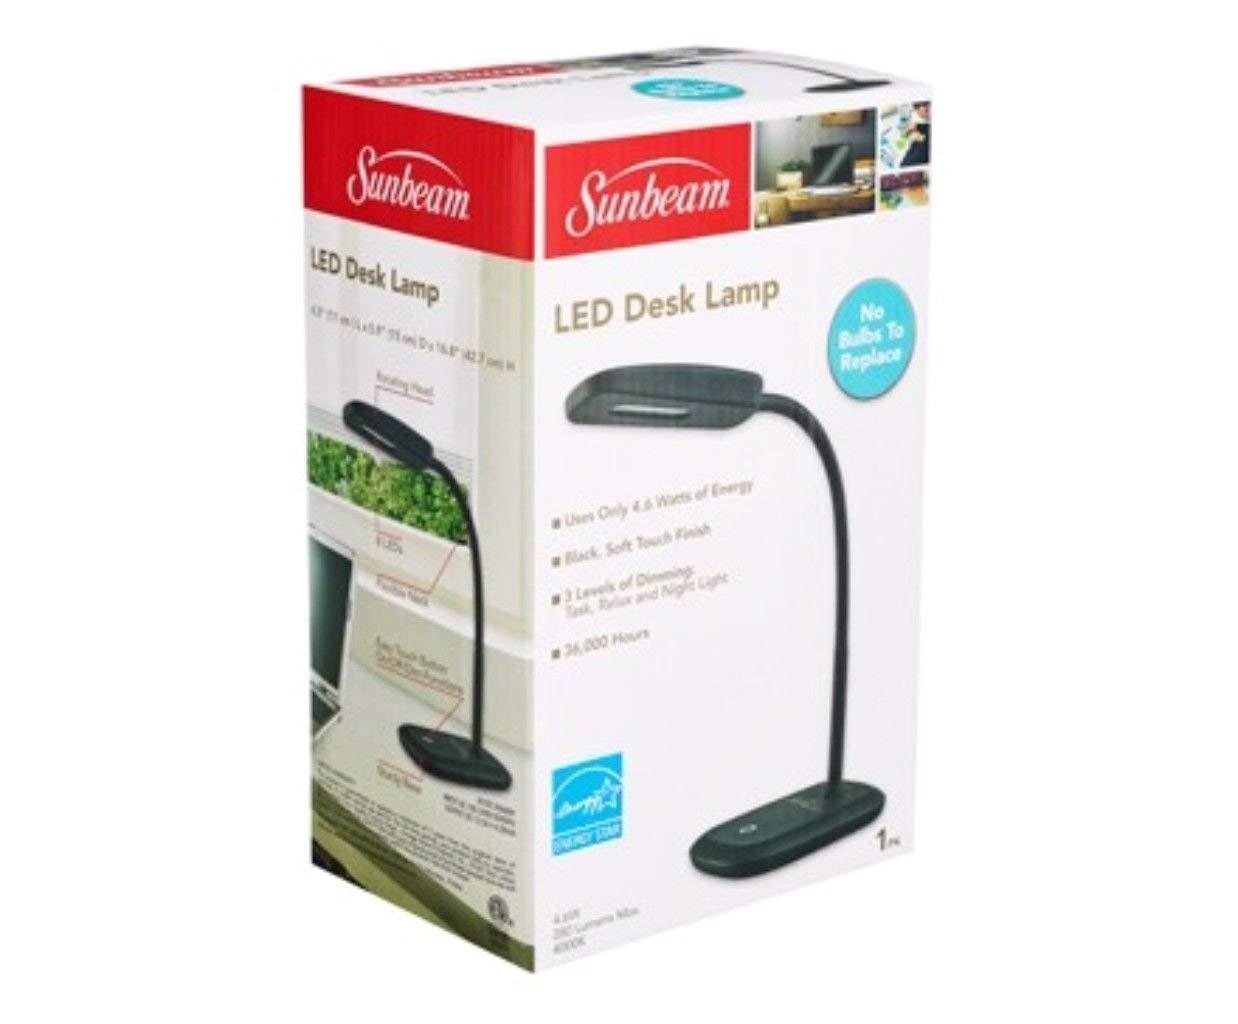 amazon com new sunbeam flexible neck led desk lamp adjustable light energy star black sports outdoors